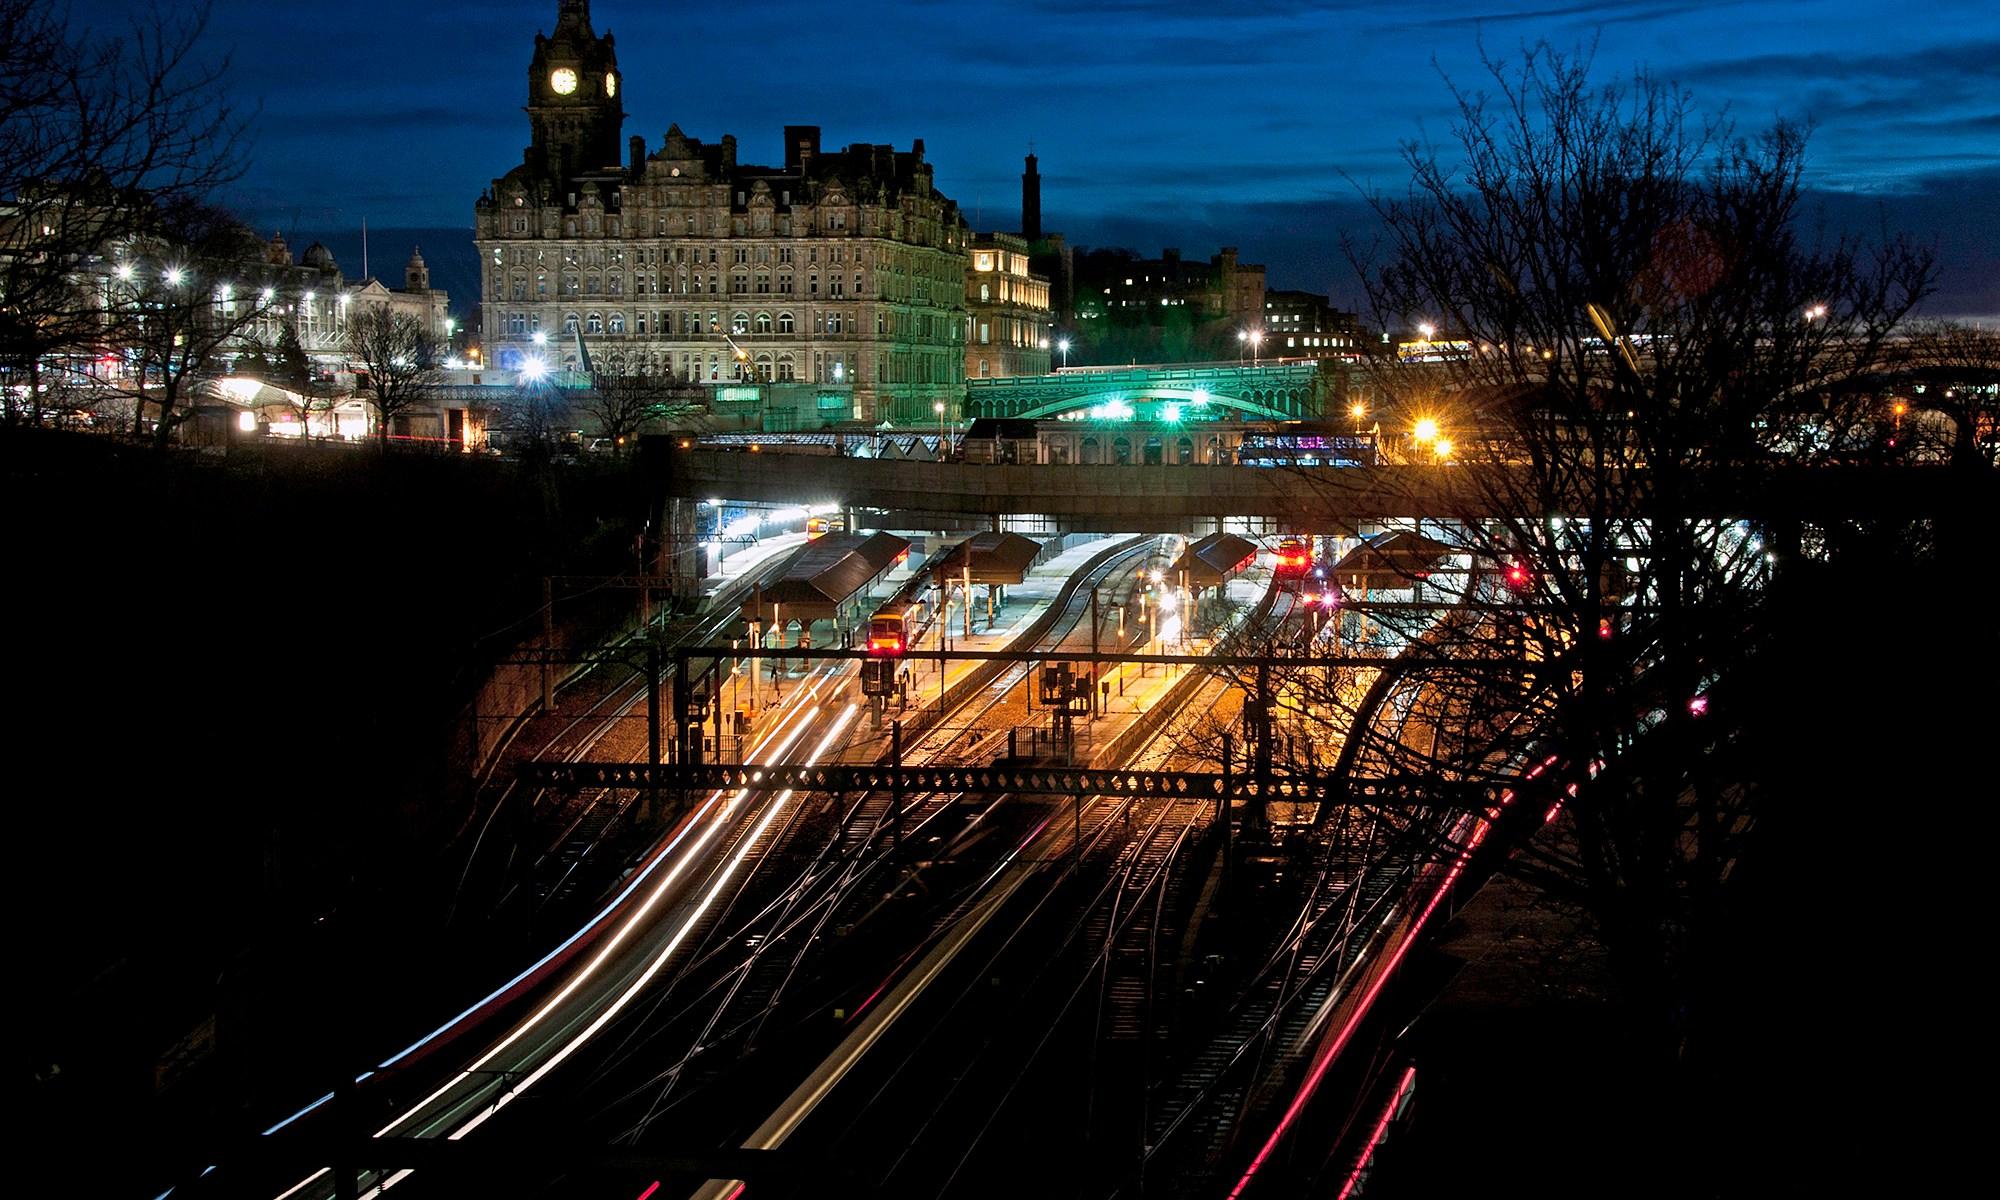 Edinburgh Waverley Station at Night